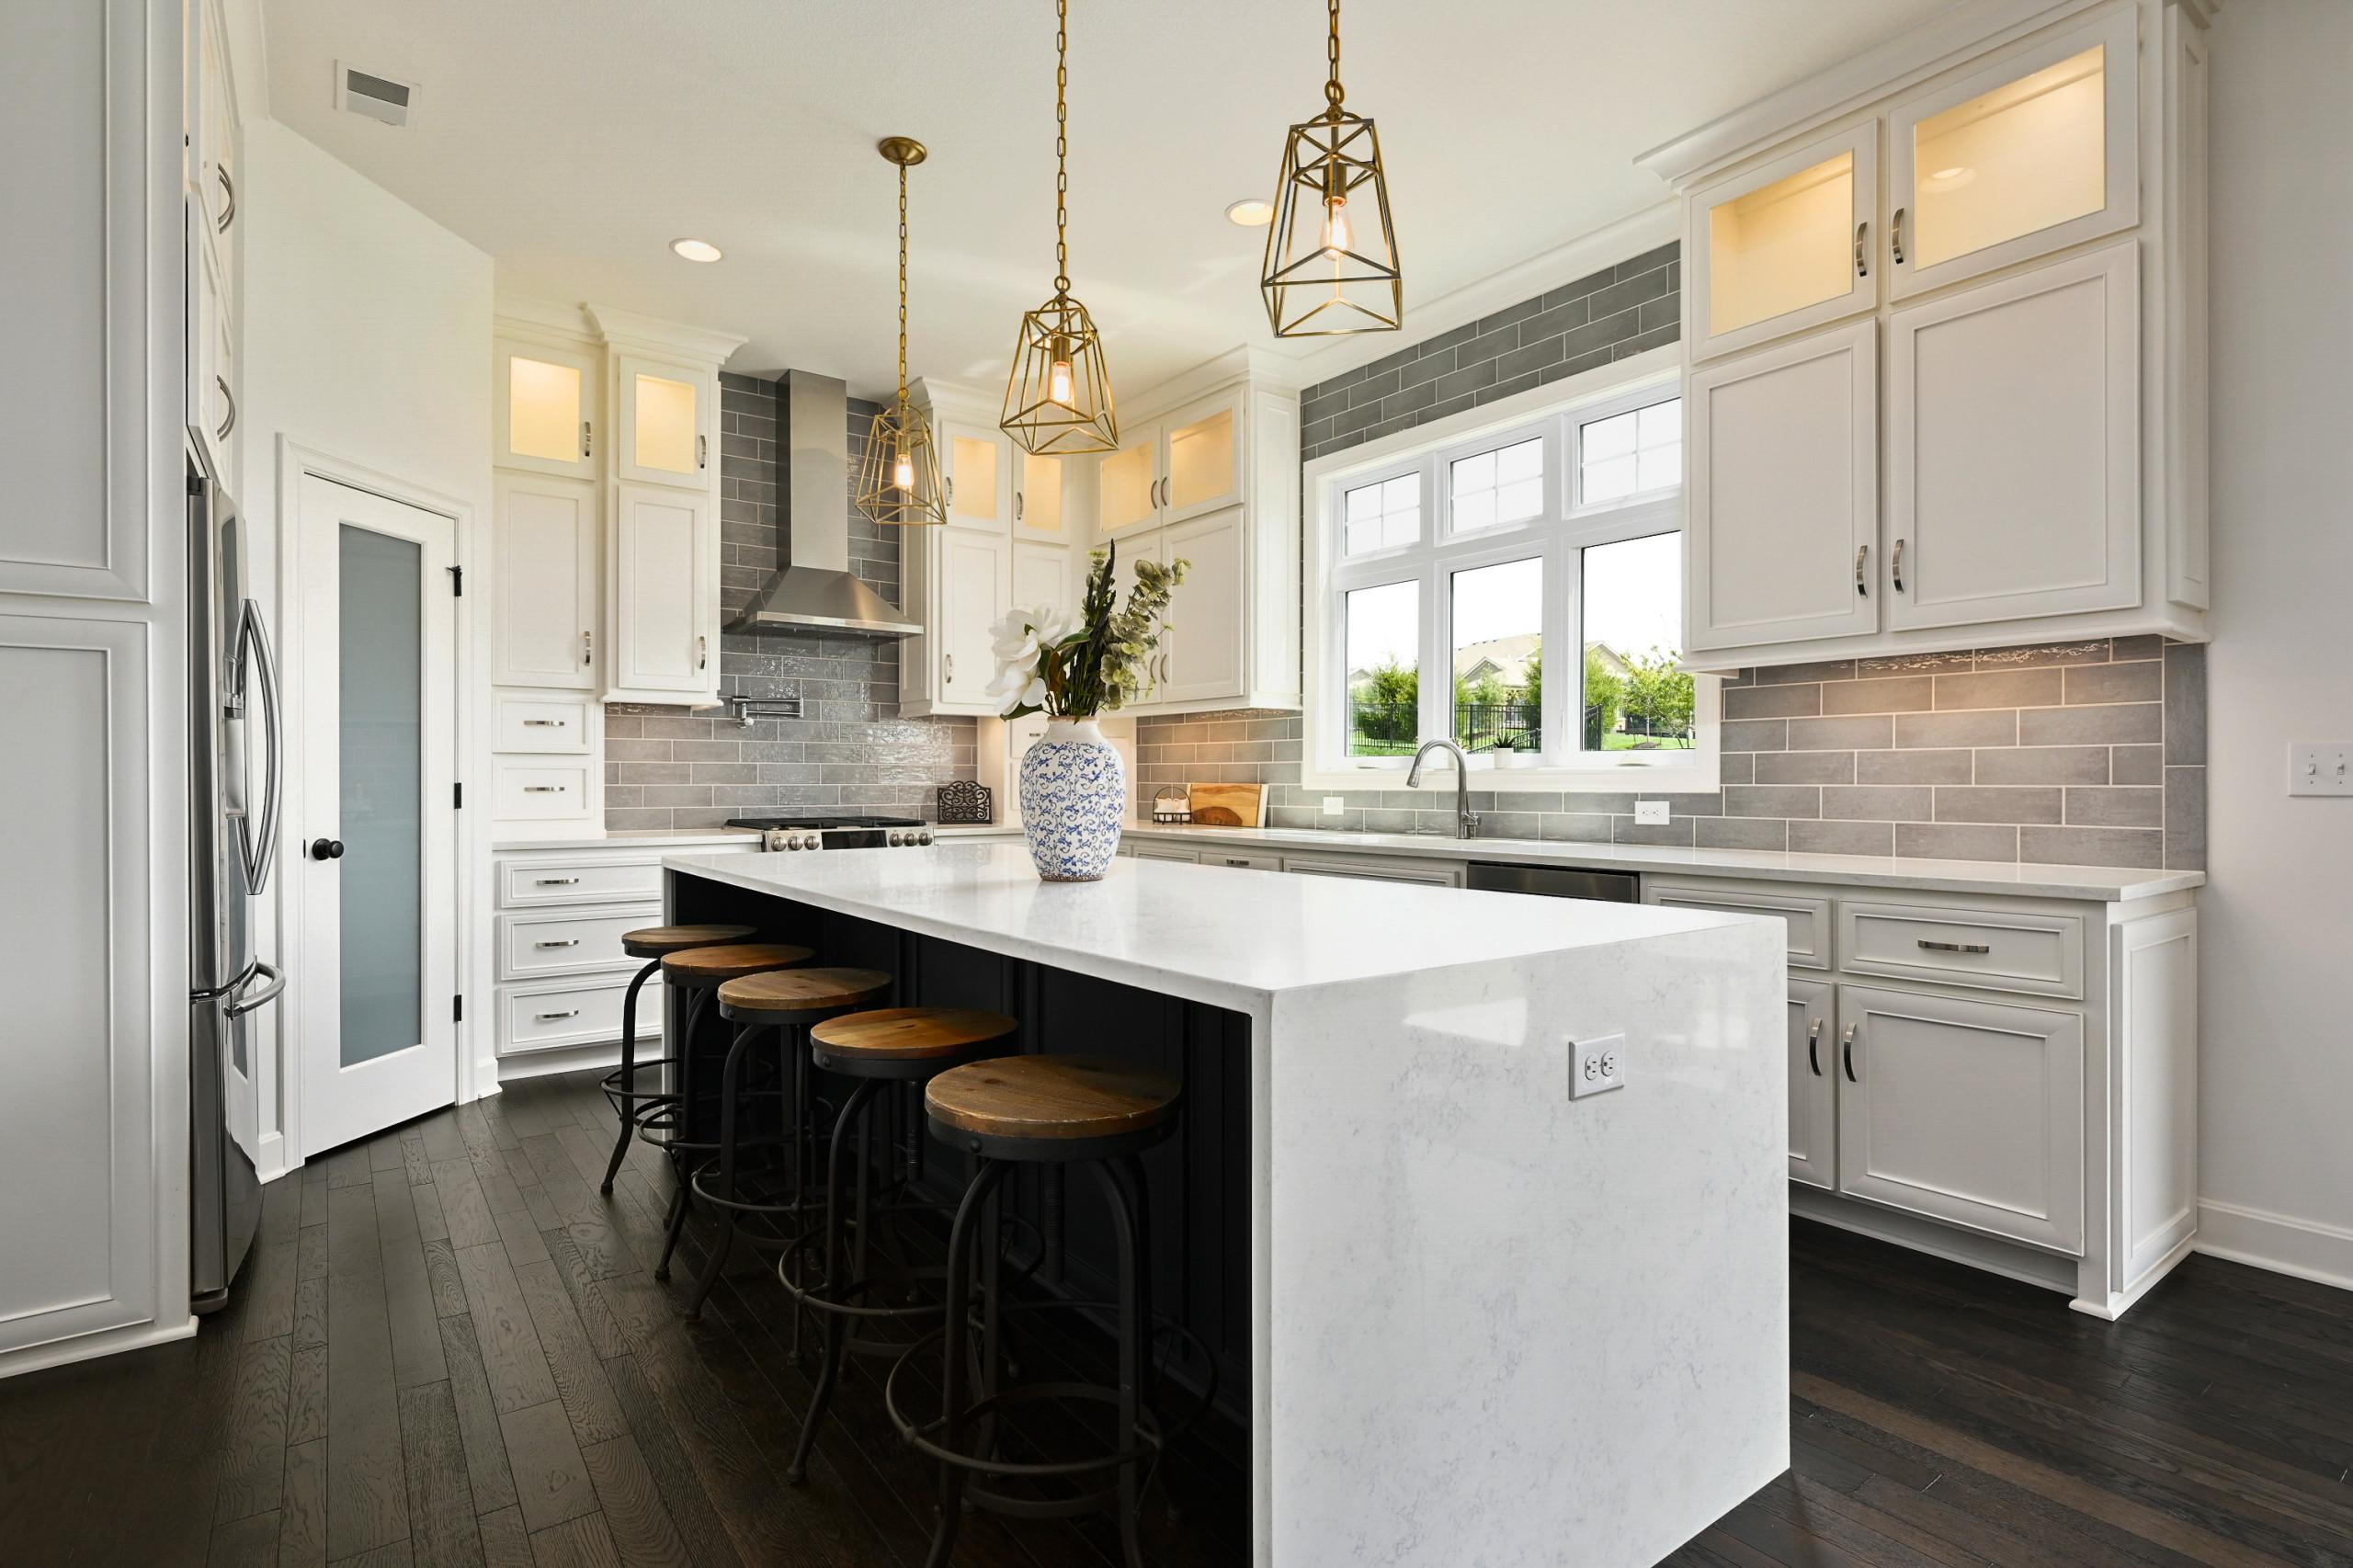 75 Gray Subway Tile Kitchen Backsplash Pictures Ideas Houzz